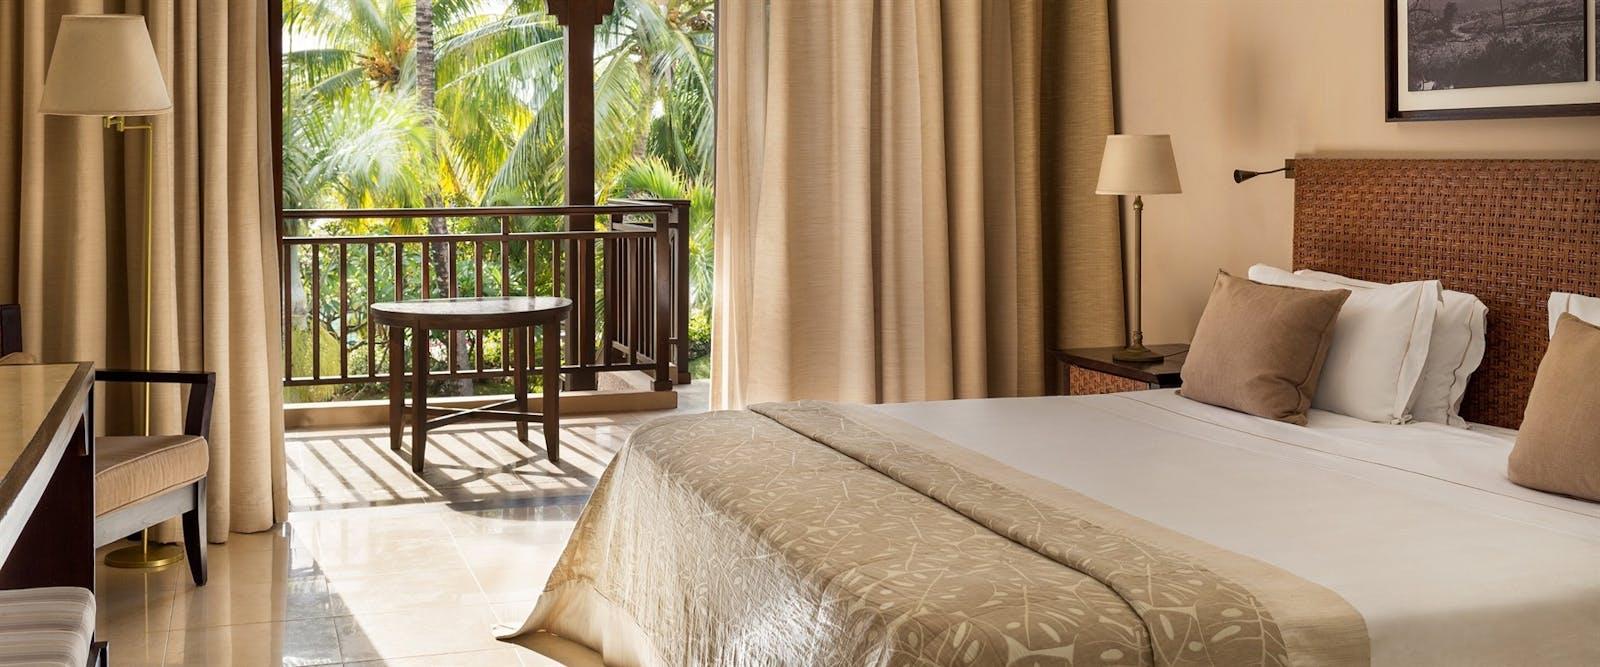 Lux Le Morne Mauritius World Renowned Luxury Hotel Afrika Et Tour Horseback Riding 10 12 Superior Room At